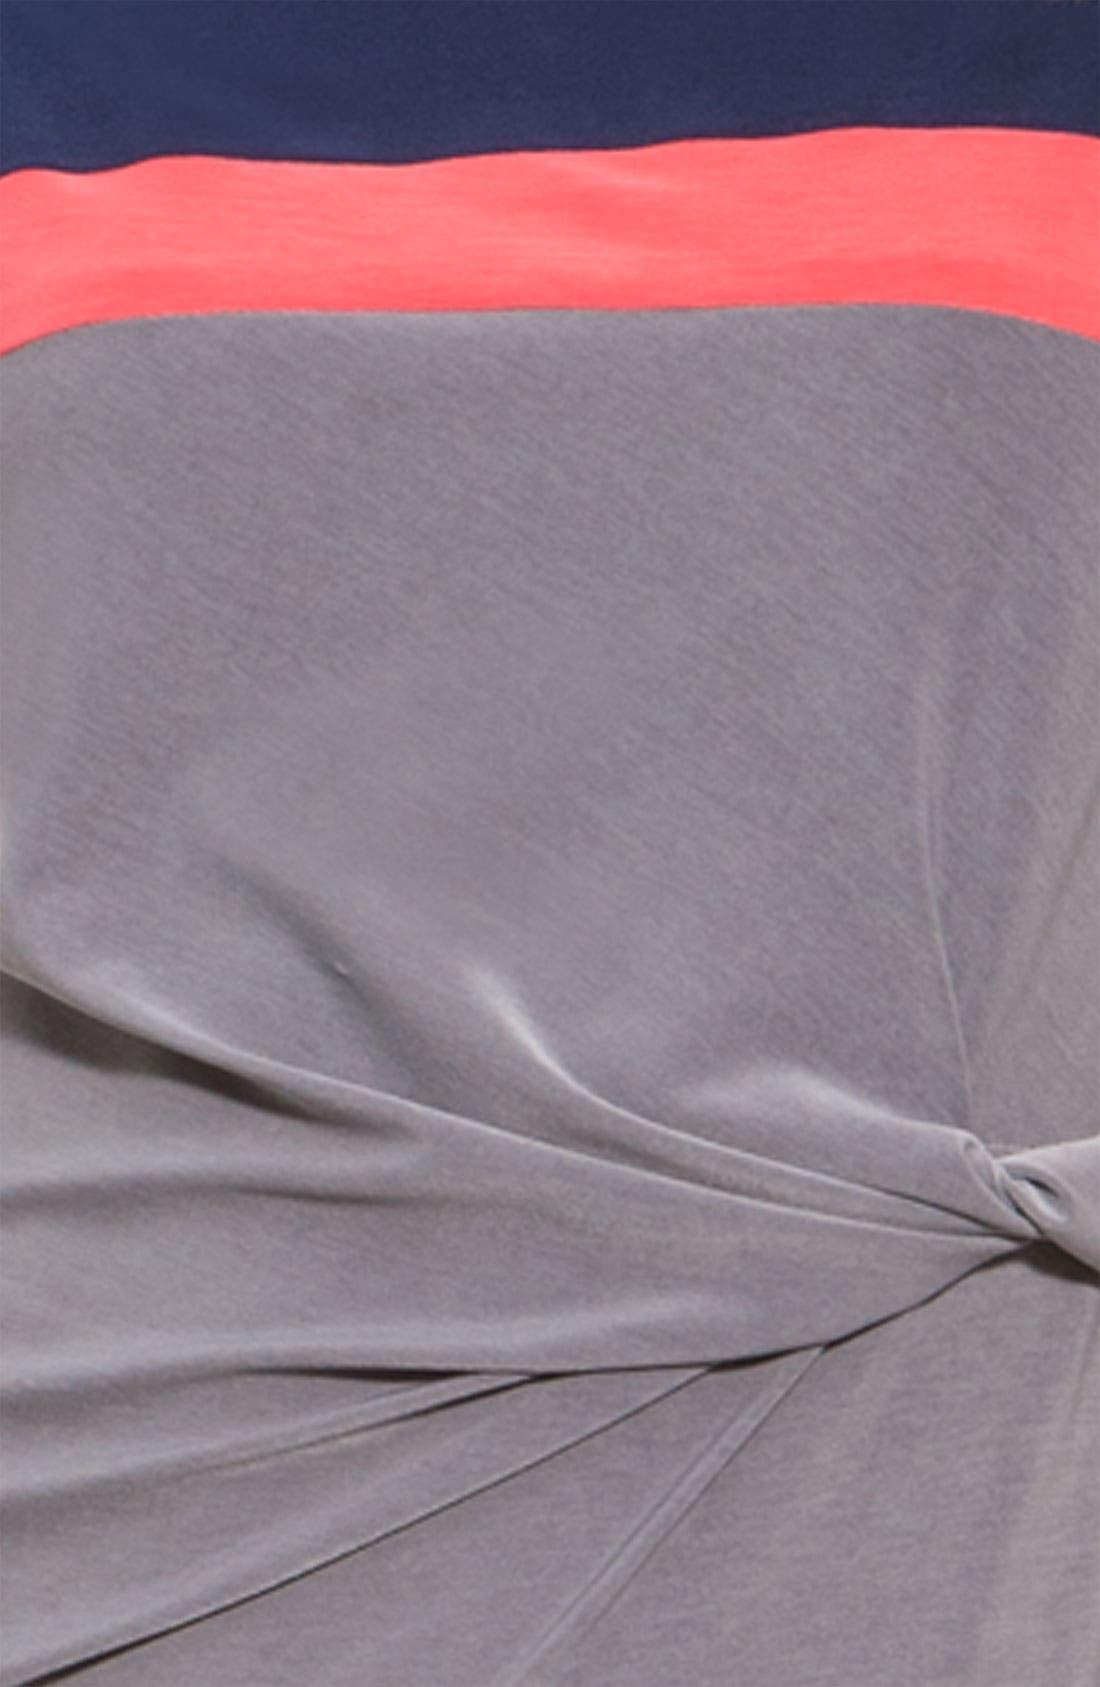 ALEX & AVA, Twist Front Colorblock Jersey Sheath Dress, Alternate thumbnail 2, color, 020